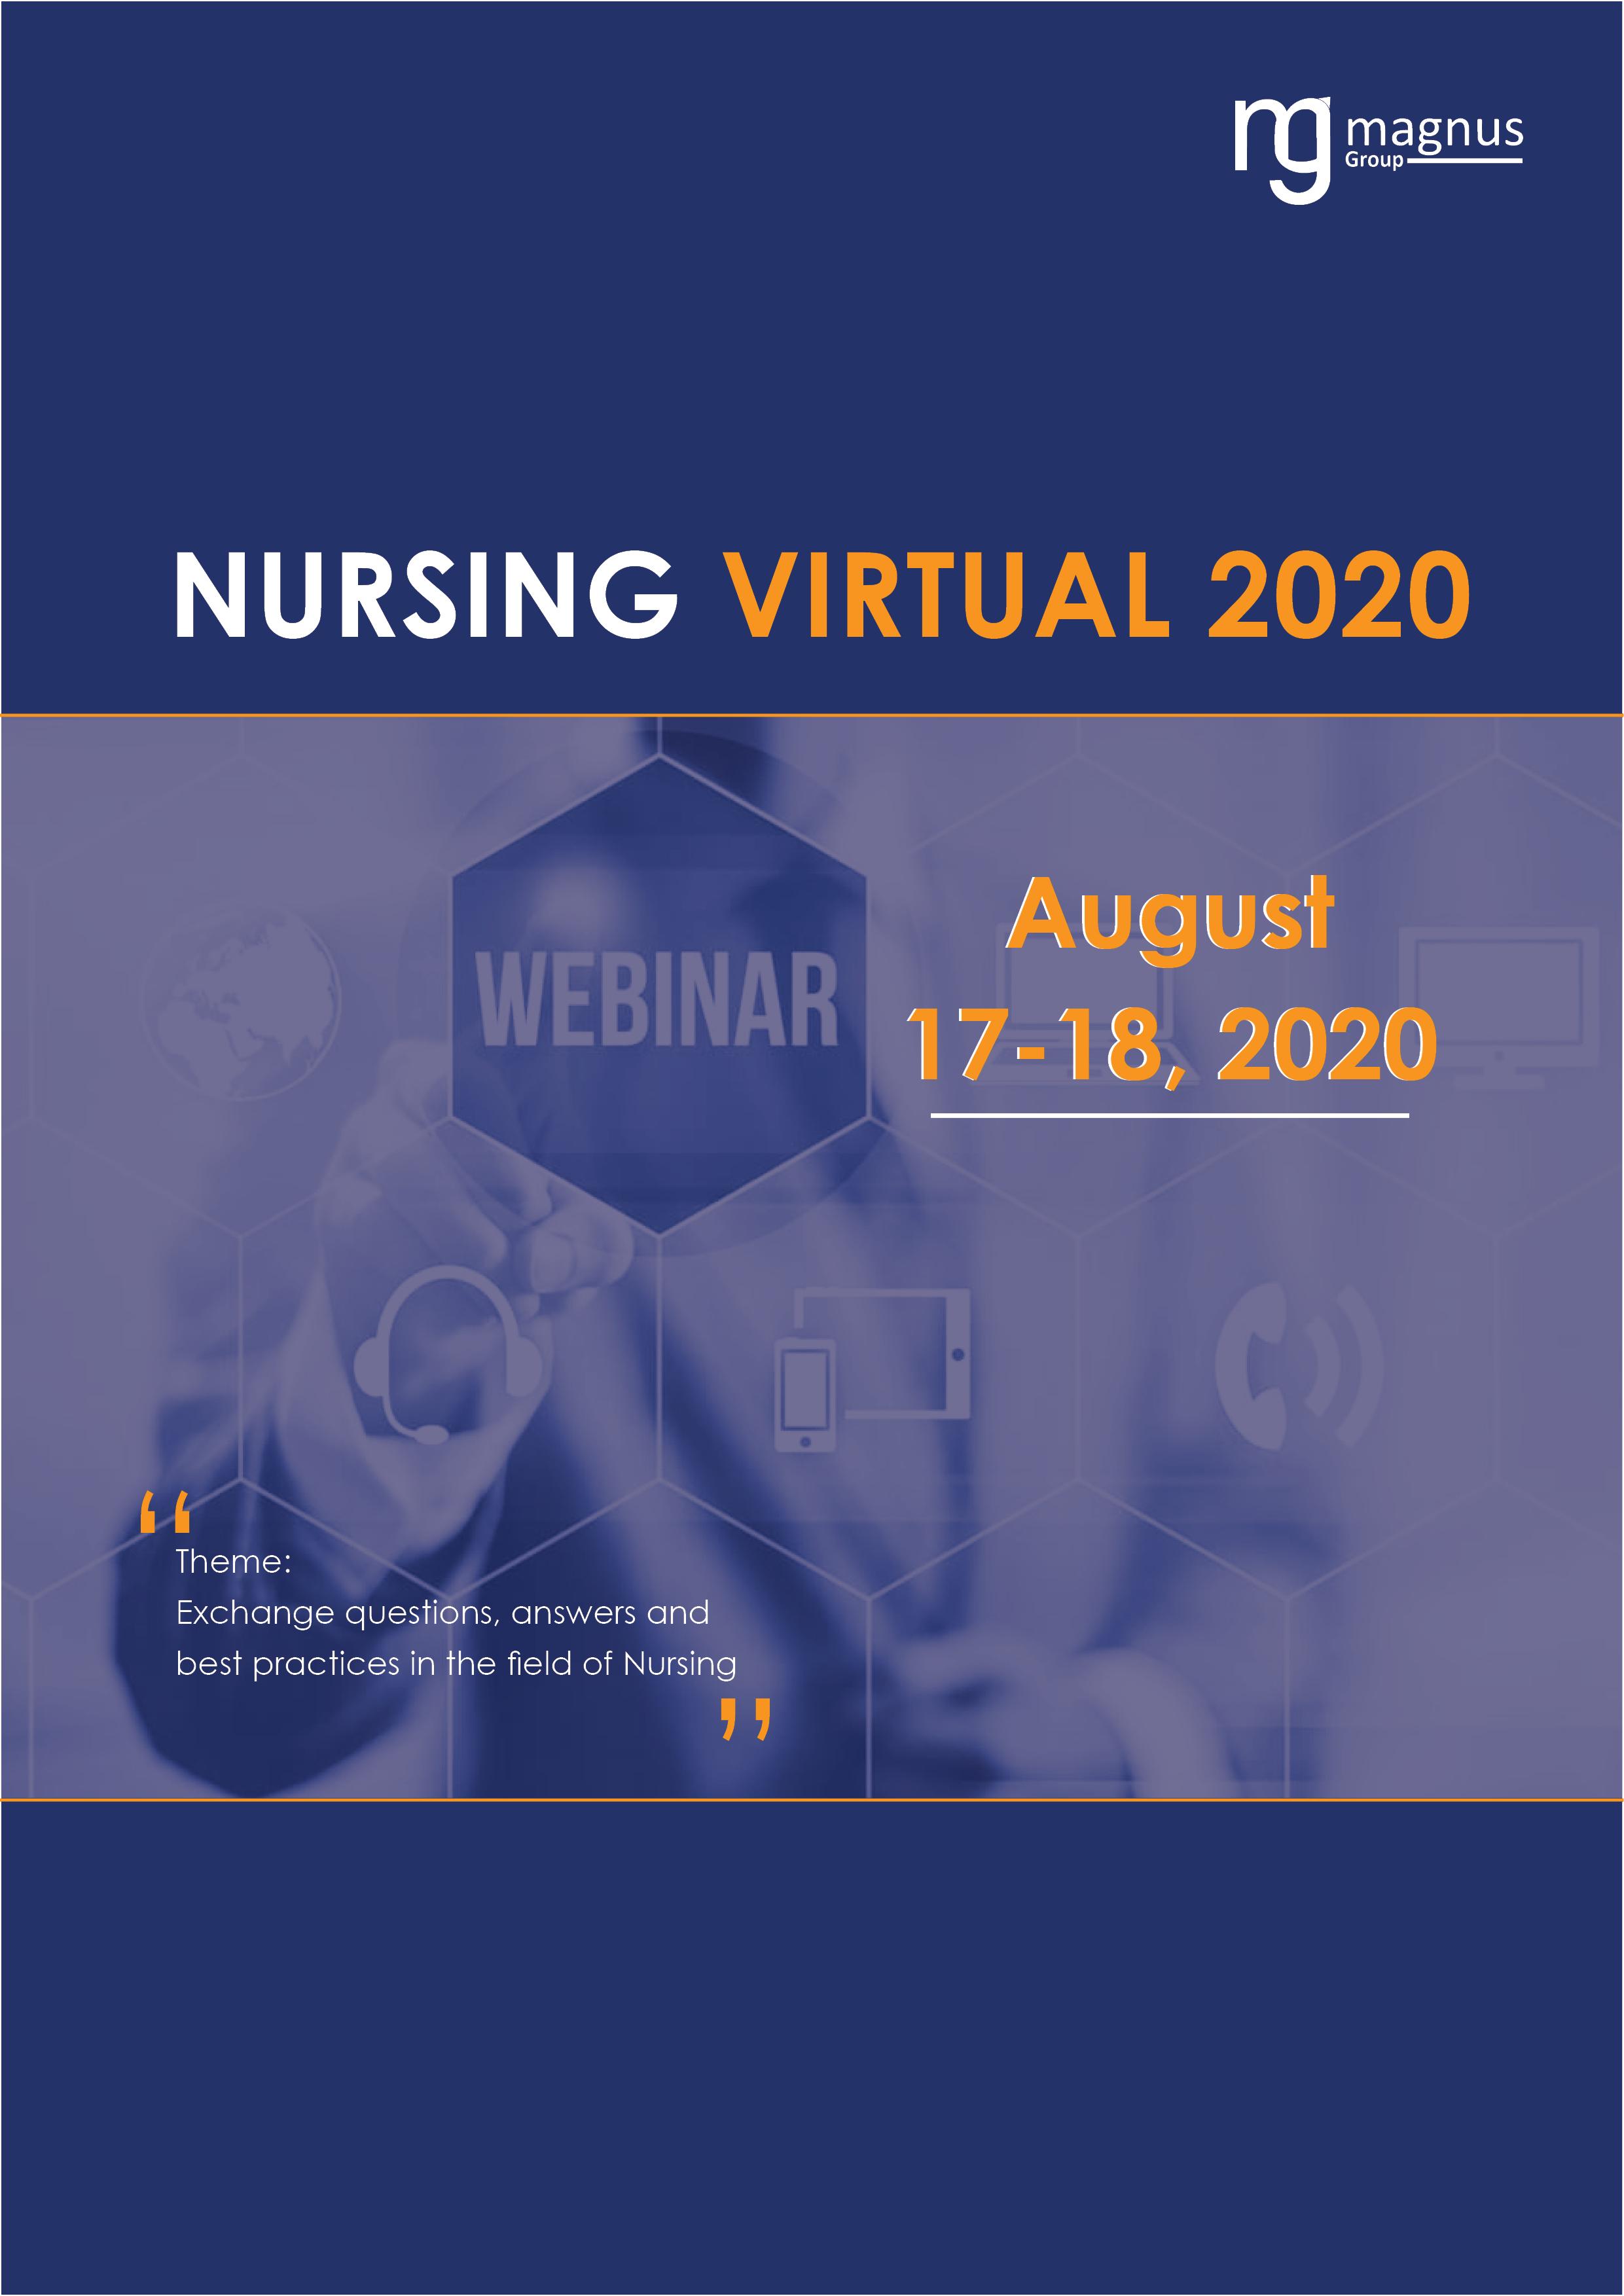 2nd Edition of International Webinar on Nursing | Online Event Book